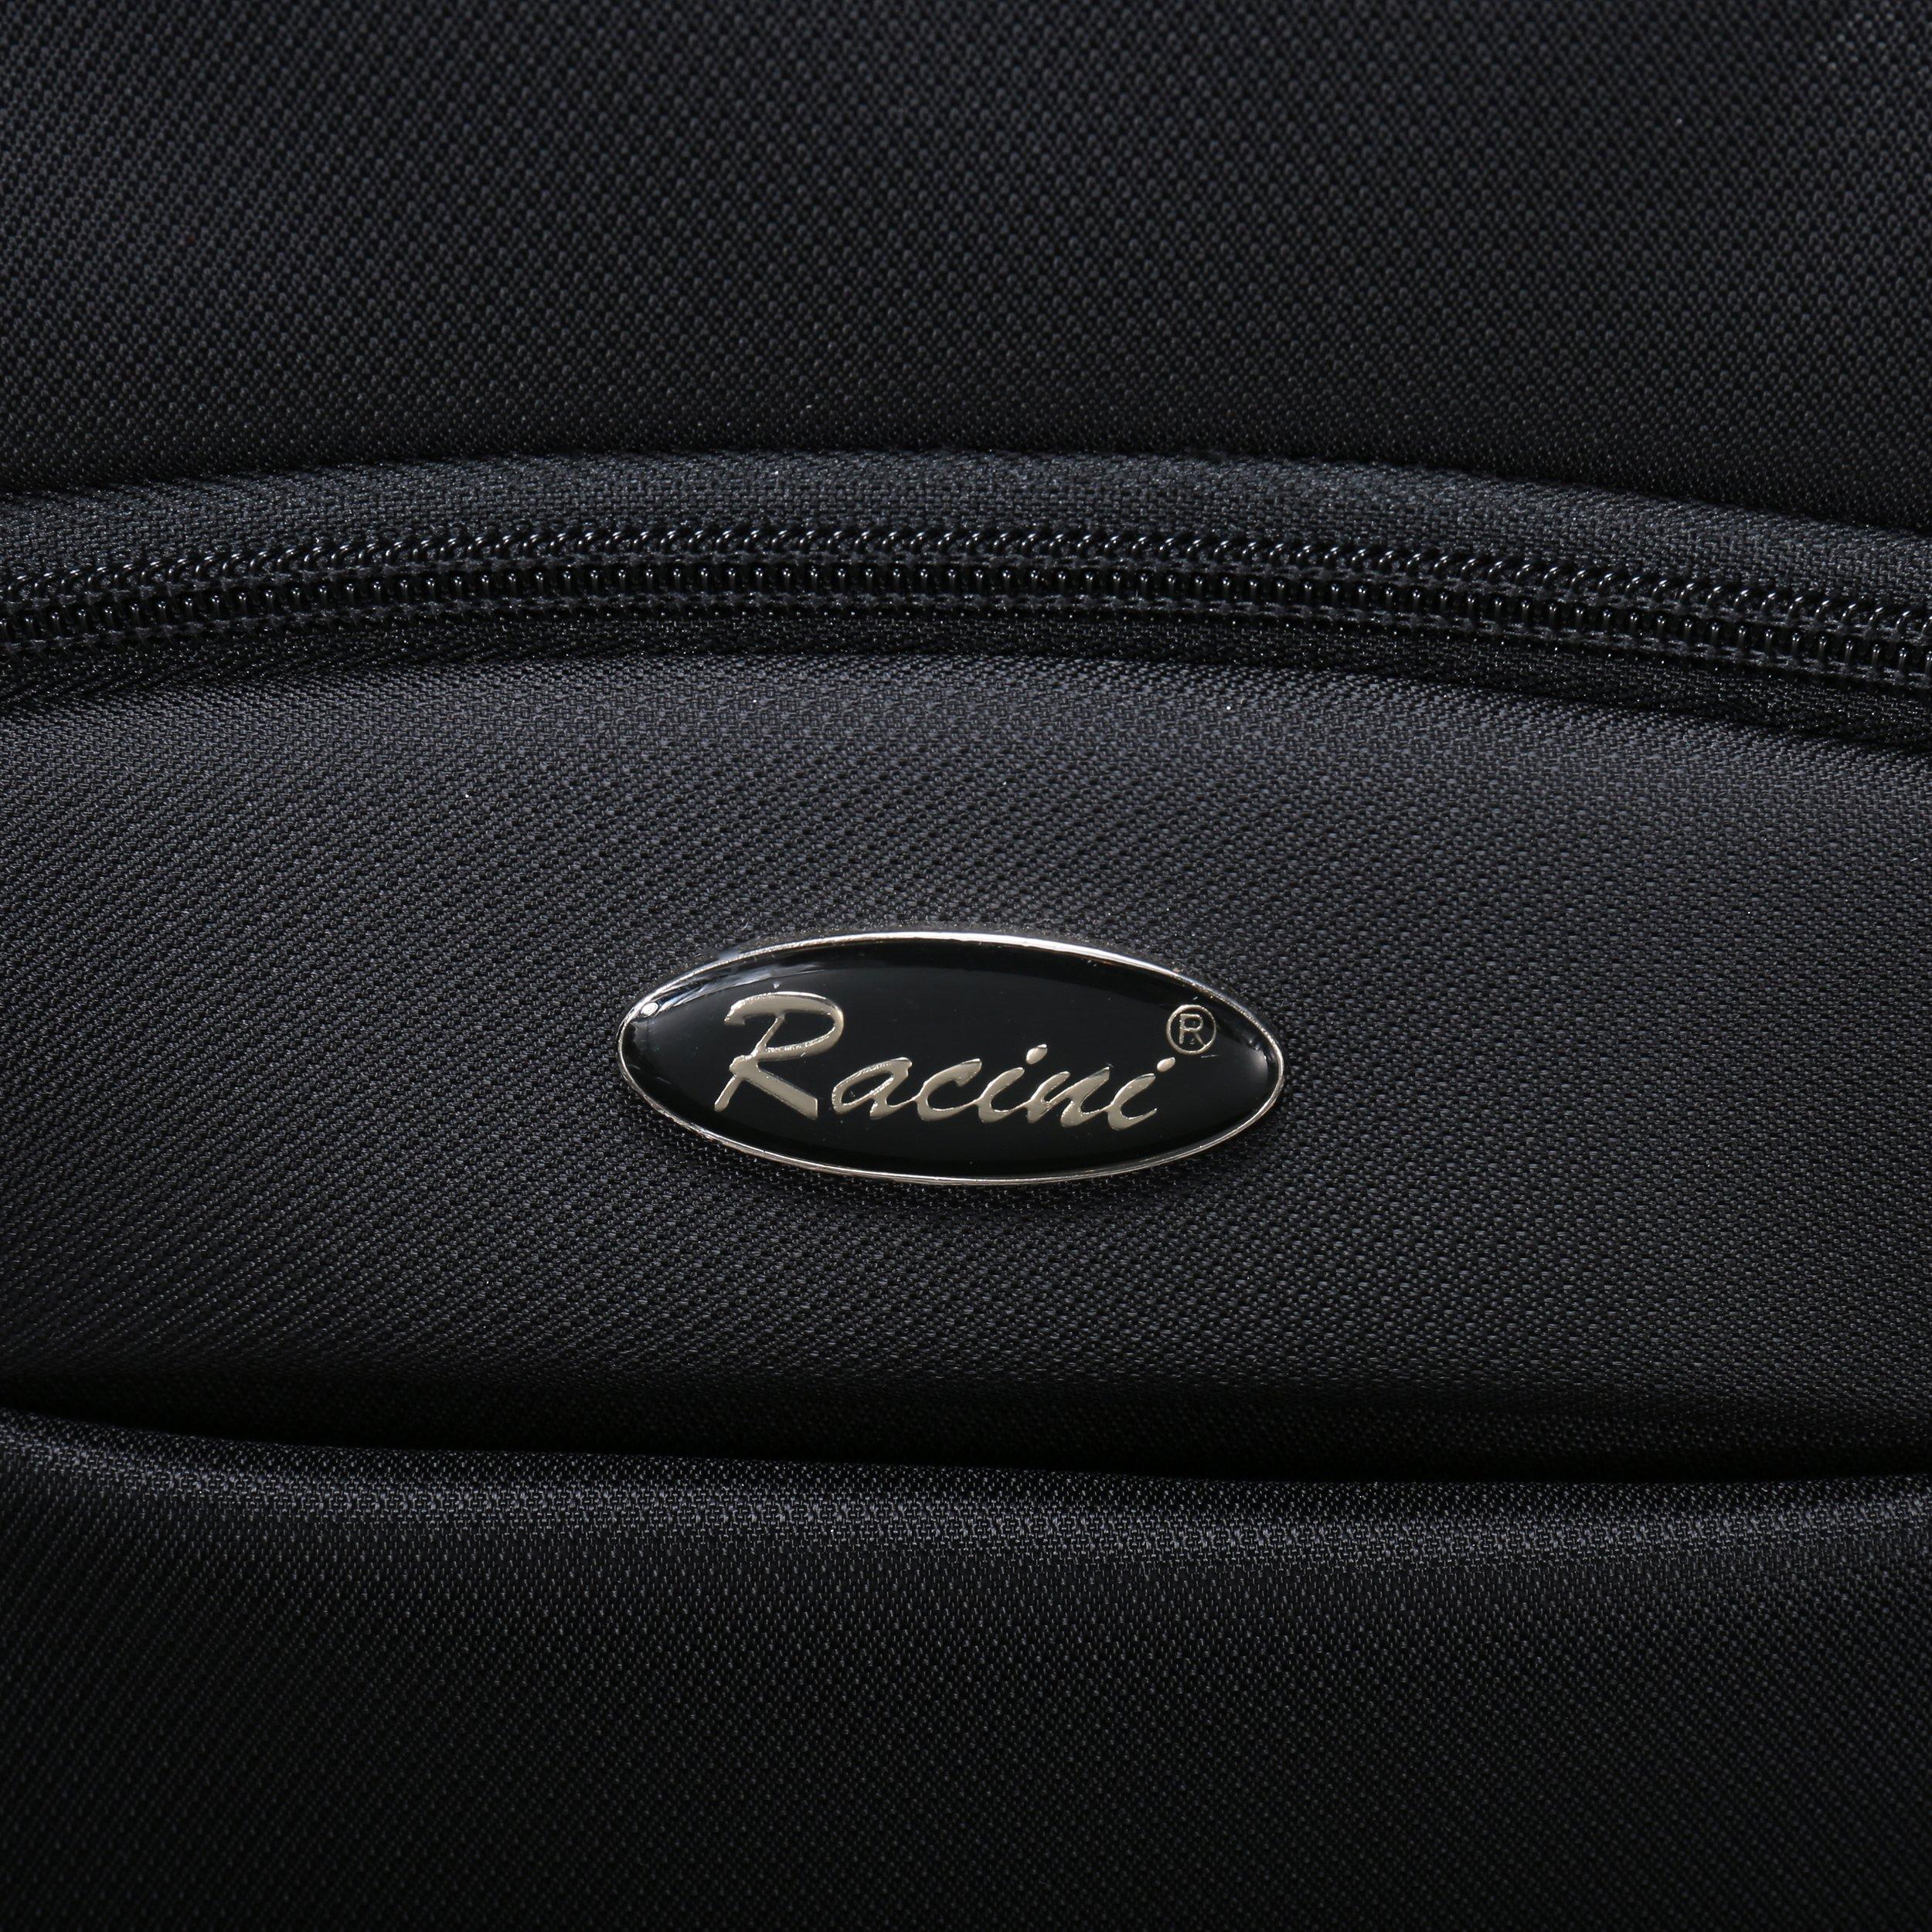 Racini Nylon Waterproof Rolling Backpack, Freewheel Travel School Wheeled Backpack, Carry-on Luggage with Anti-theft Zippers (Black) by Racini (Image #9)